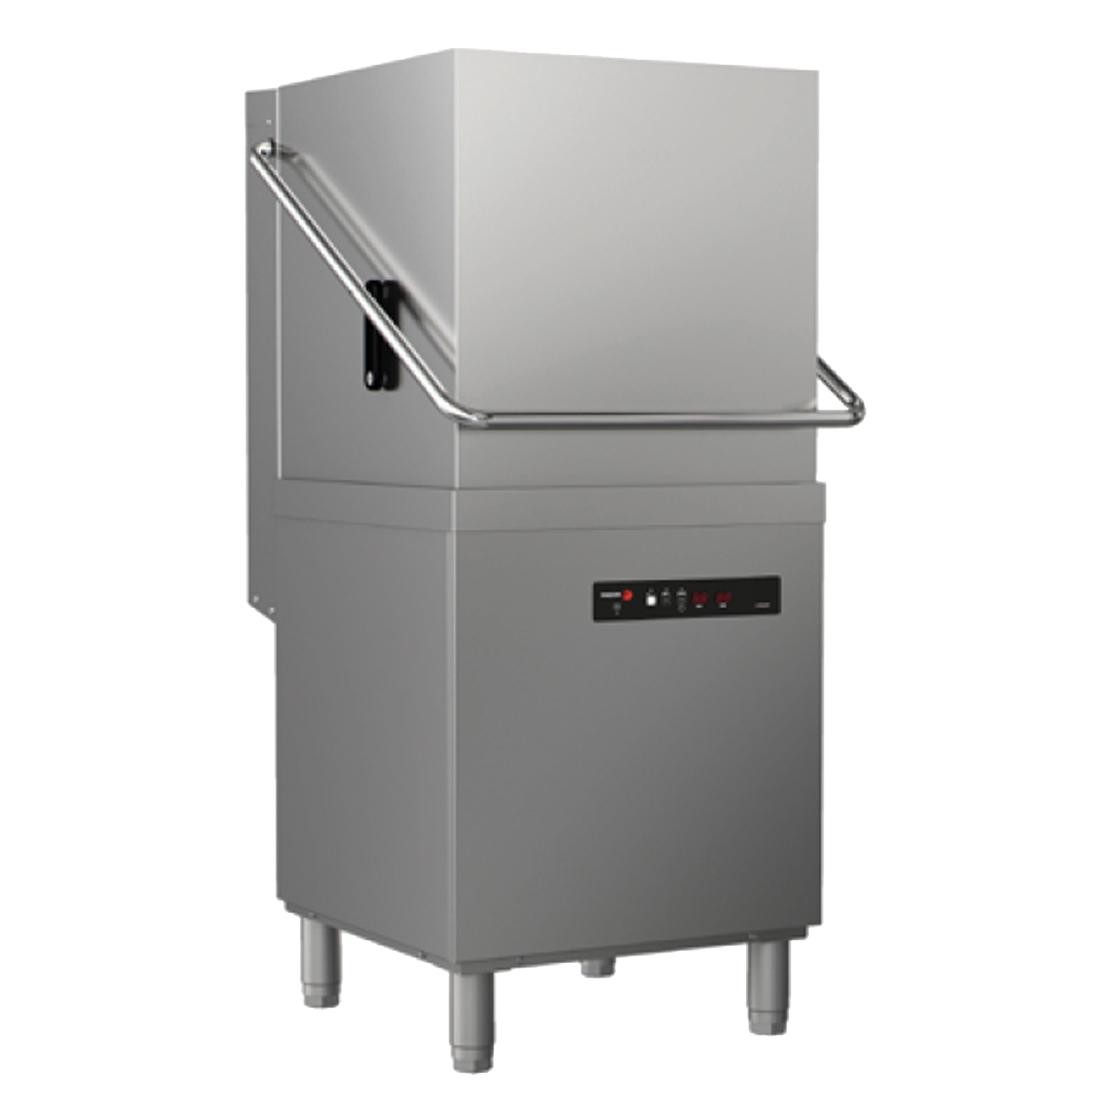 EVO-CONCEPT Pass-through Dishwasher - CO-142BDD